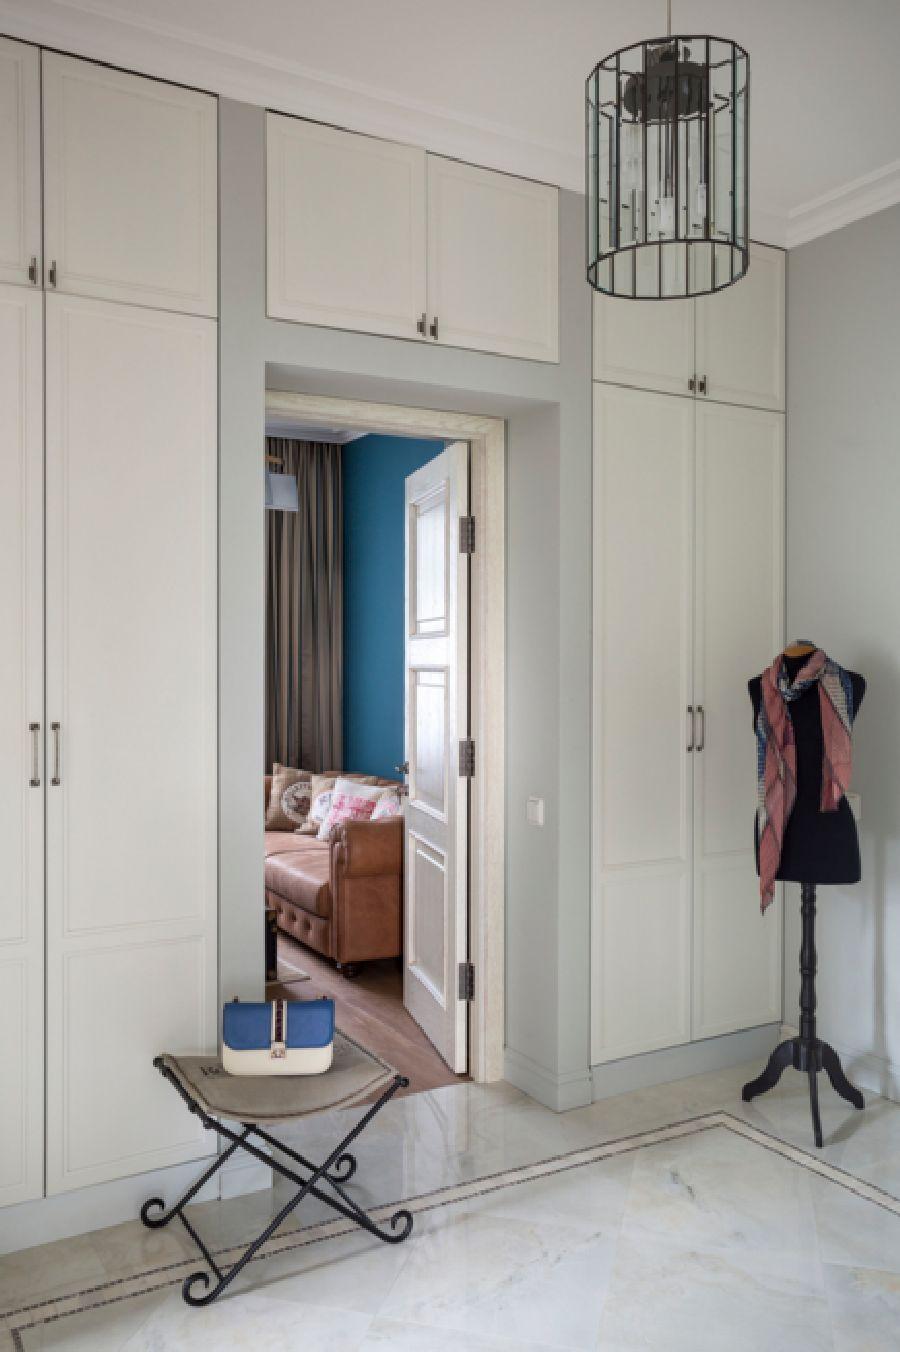 adelaparvu.com despre apartament de 80 mp patrati cu aer rustic elegant, locuinta Rusia, designer Zhenya Zhdanova (17)